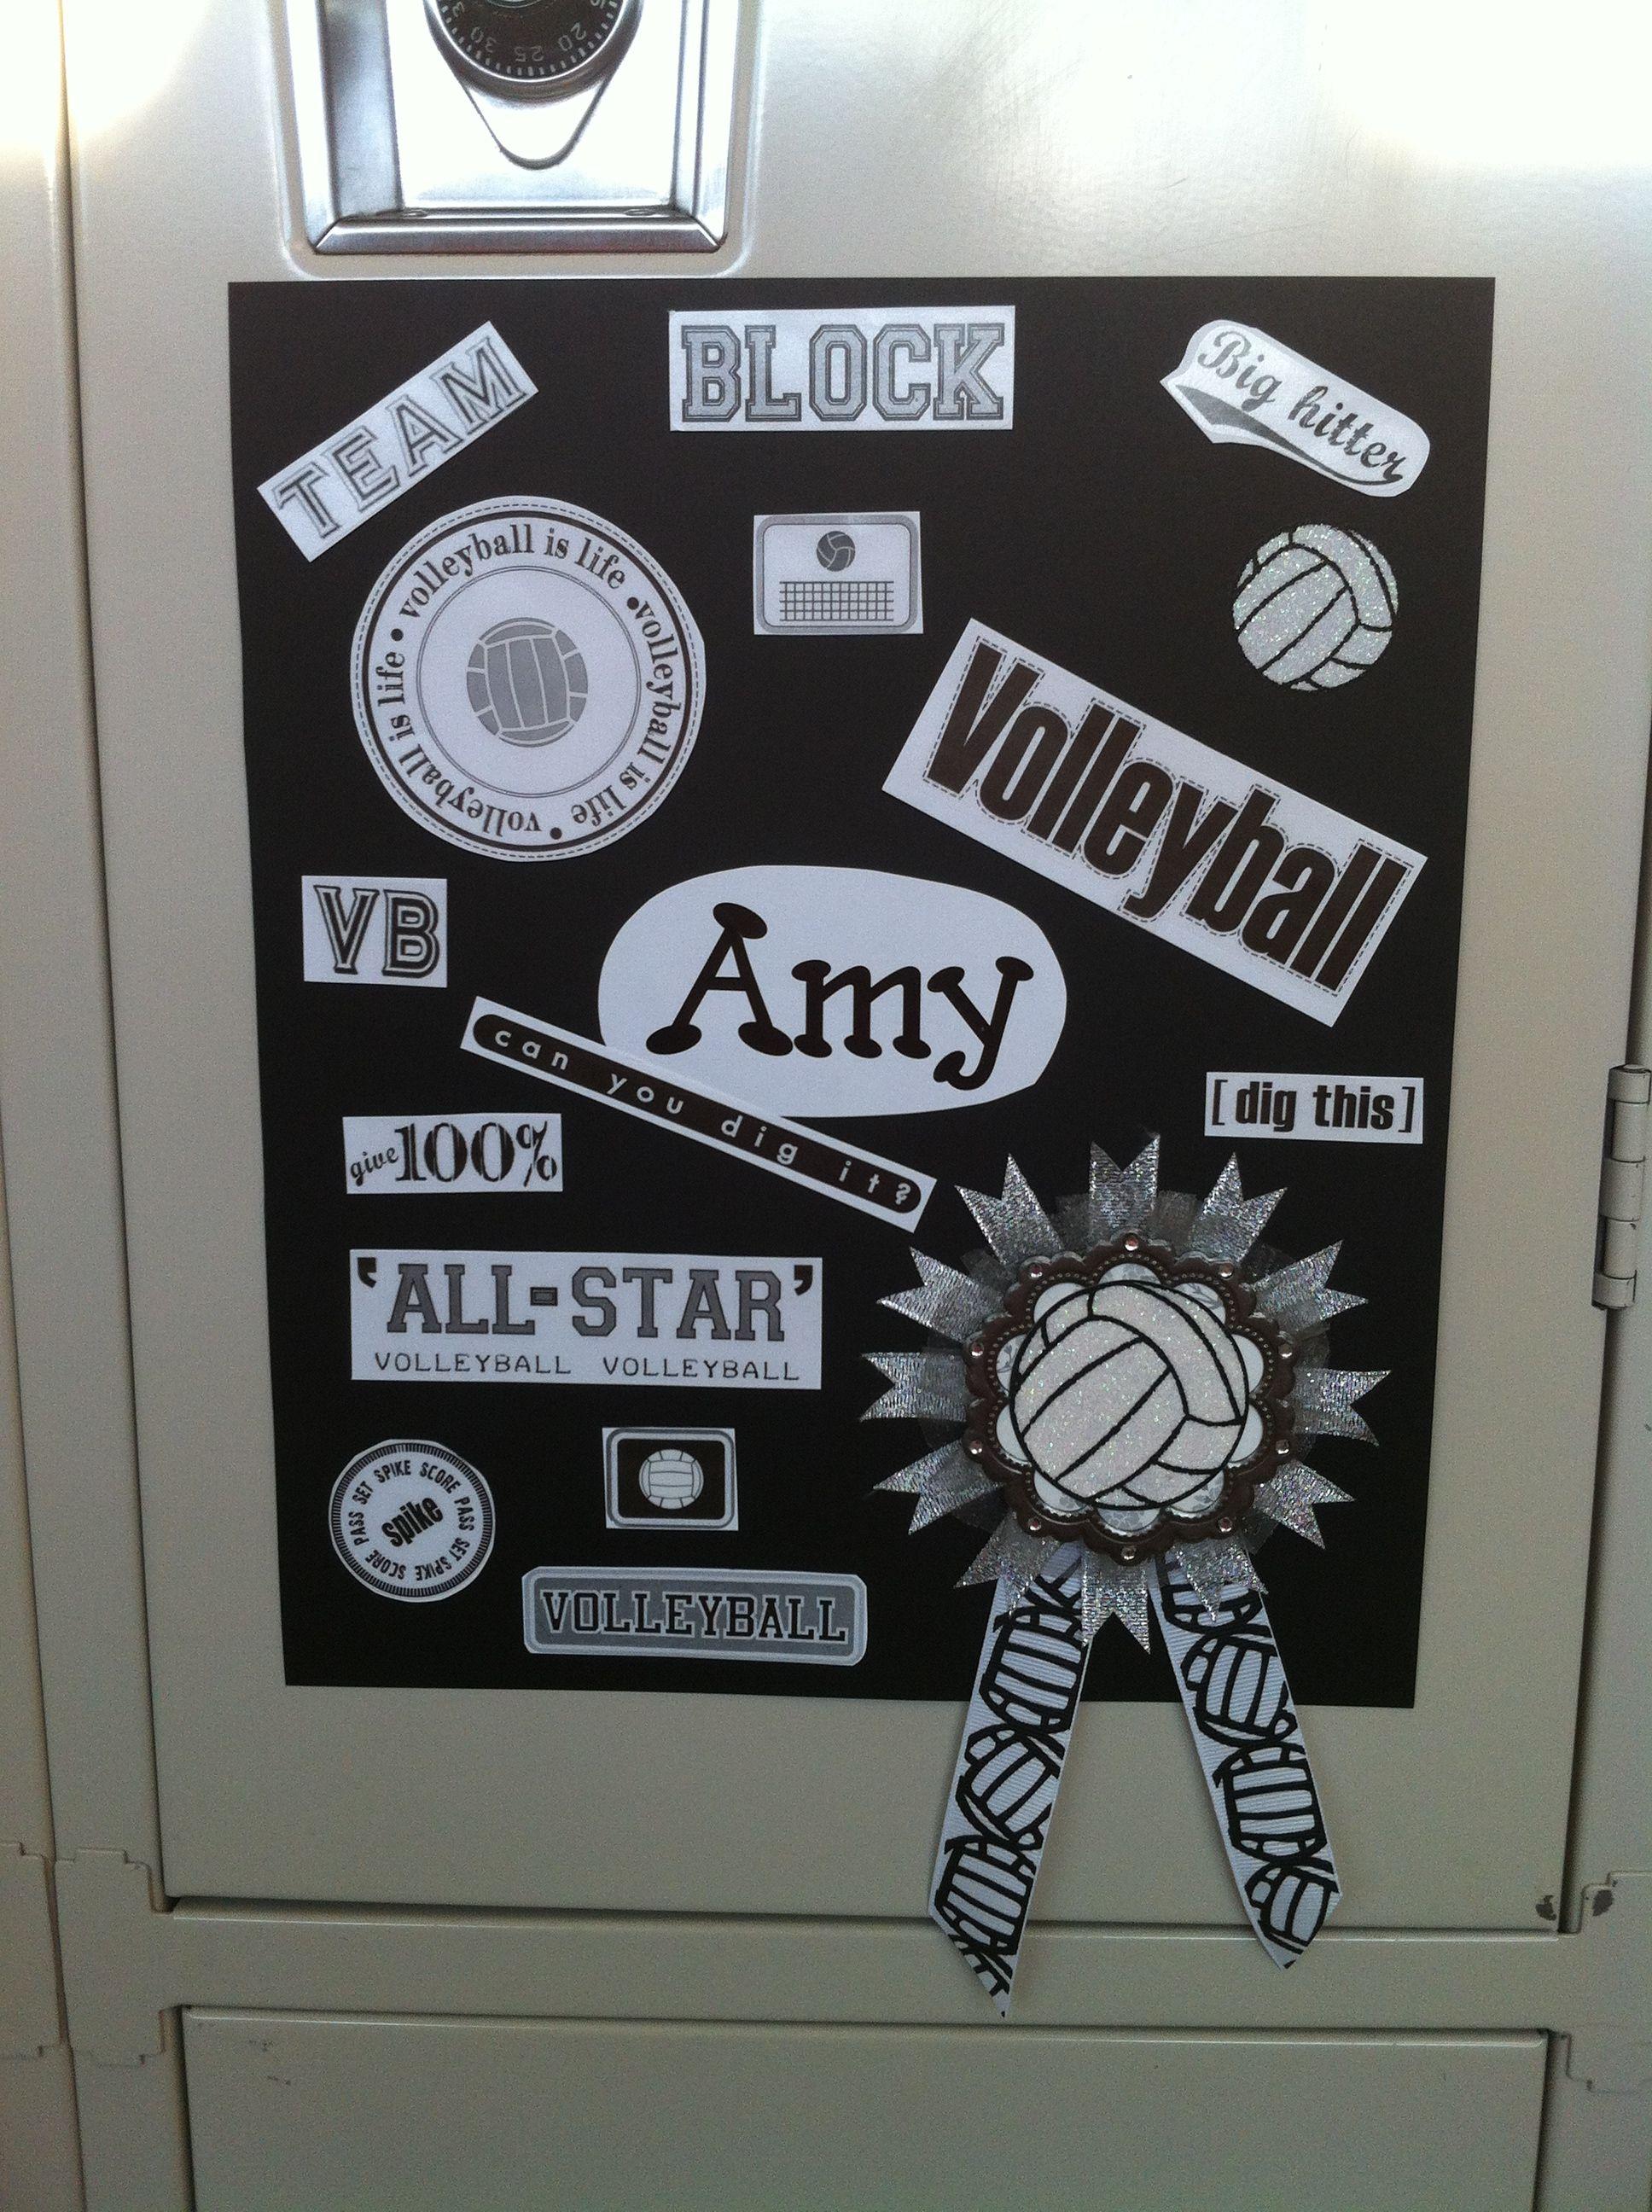 Homeschooler S Bedroom Door Locker Decoration For Spirit Week Volleyball Locker Volleyball Locker Decorations Locker Decorations